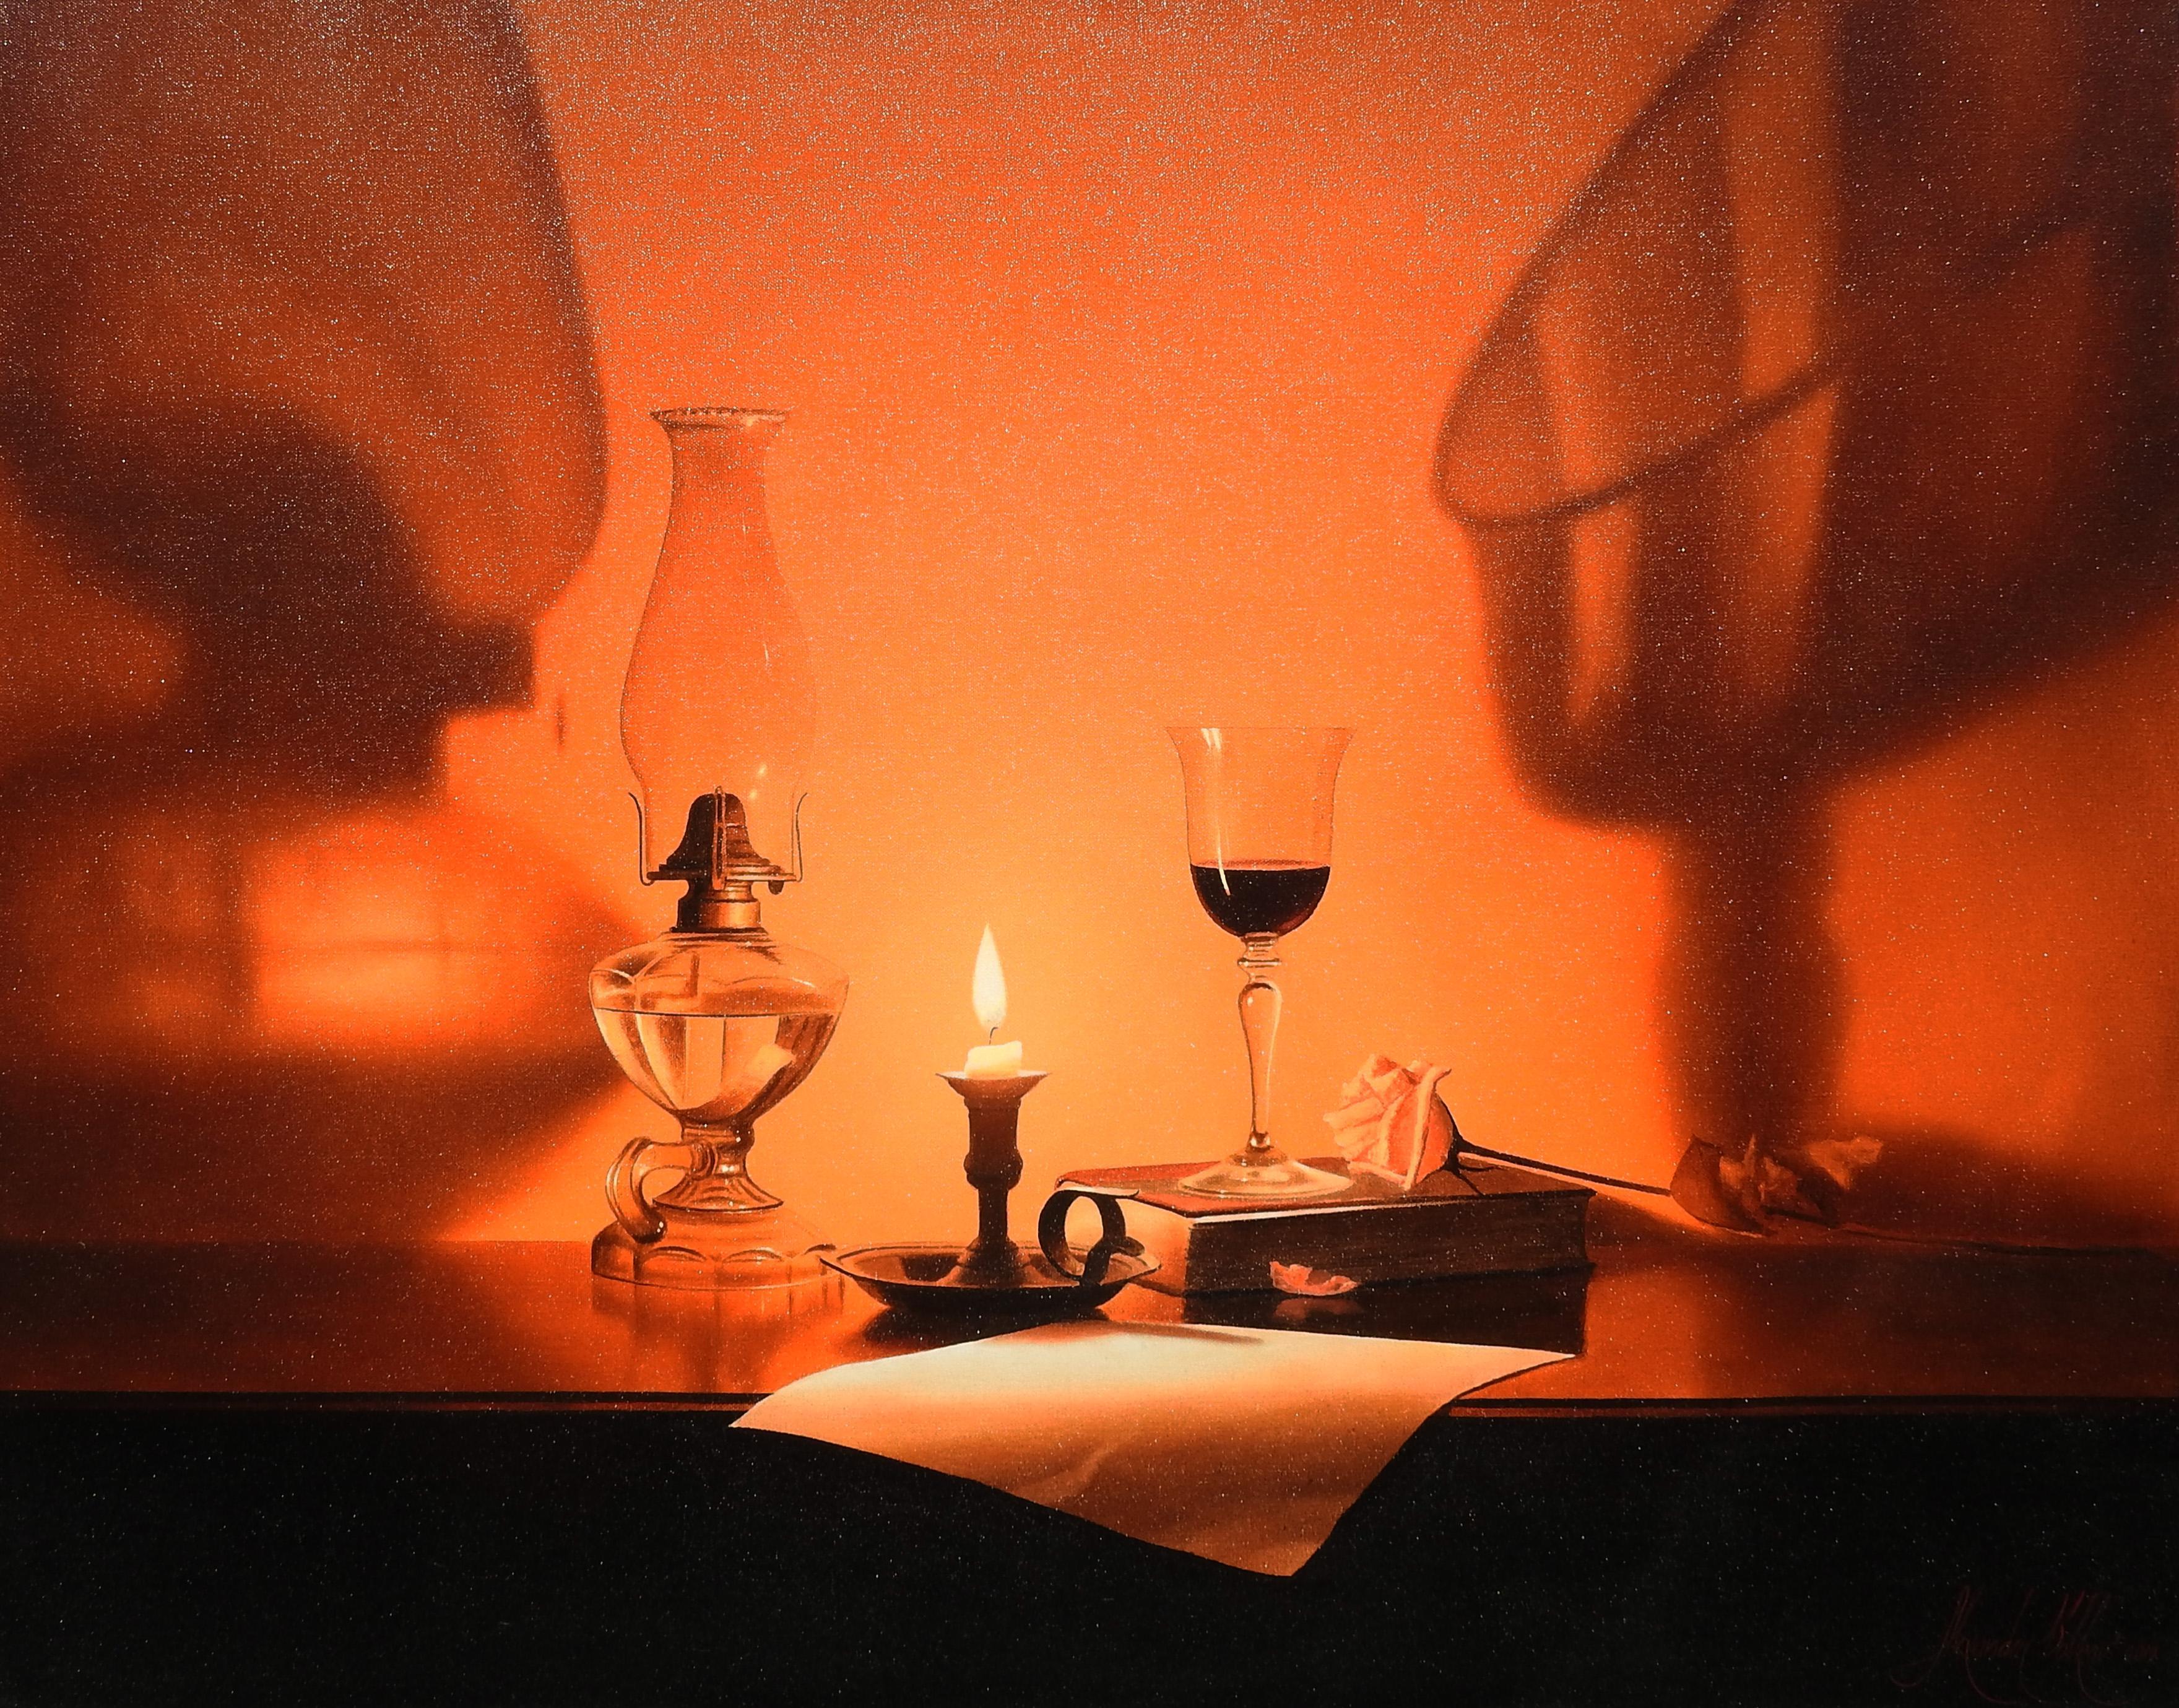 """P.S. I Love You"", Alexander Volkov, 30x40, Oil on Canvas, Realistic, Still-Life"